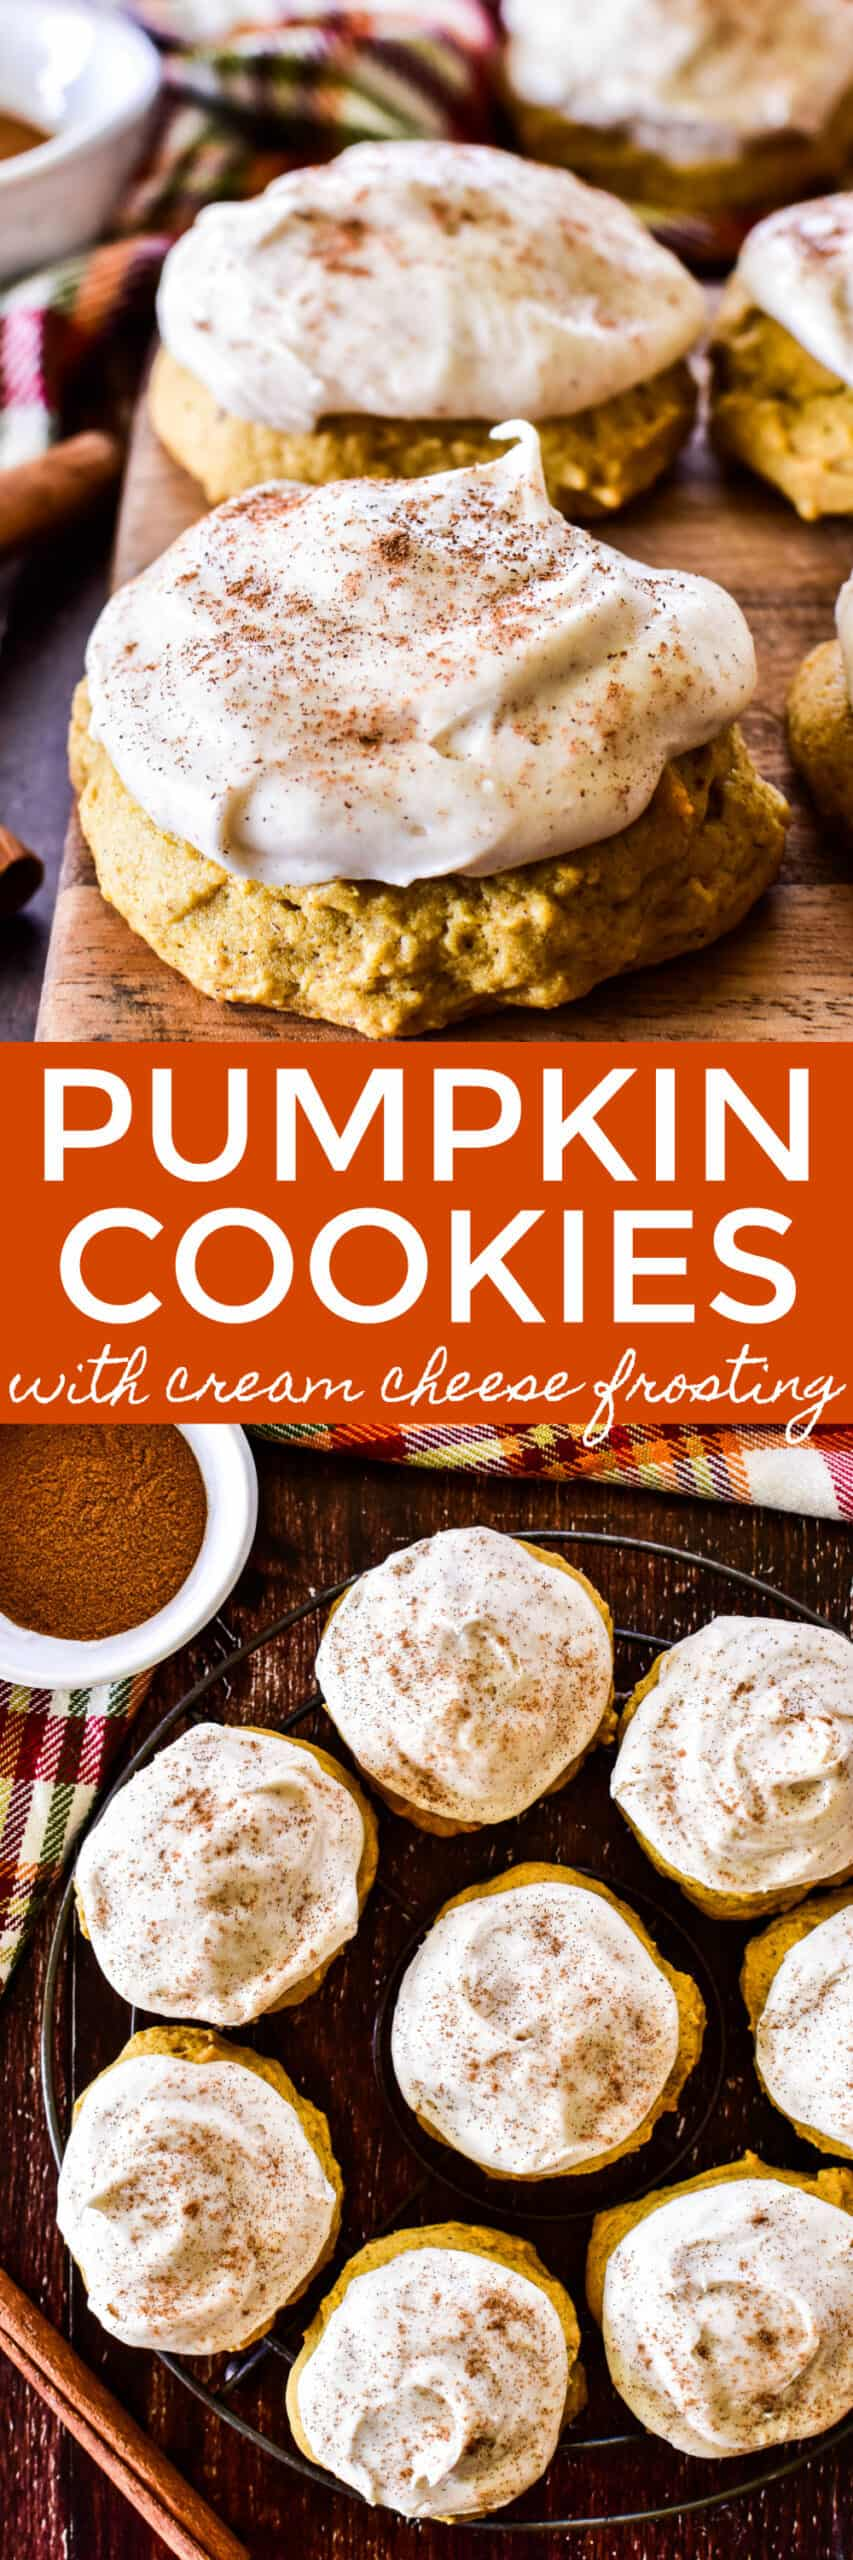 Collage image of Pumpkin Cookies